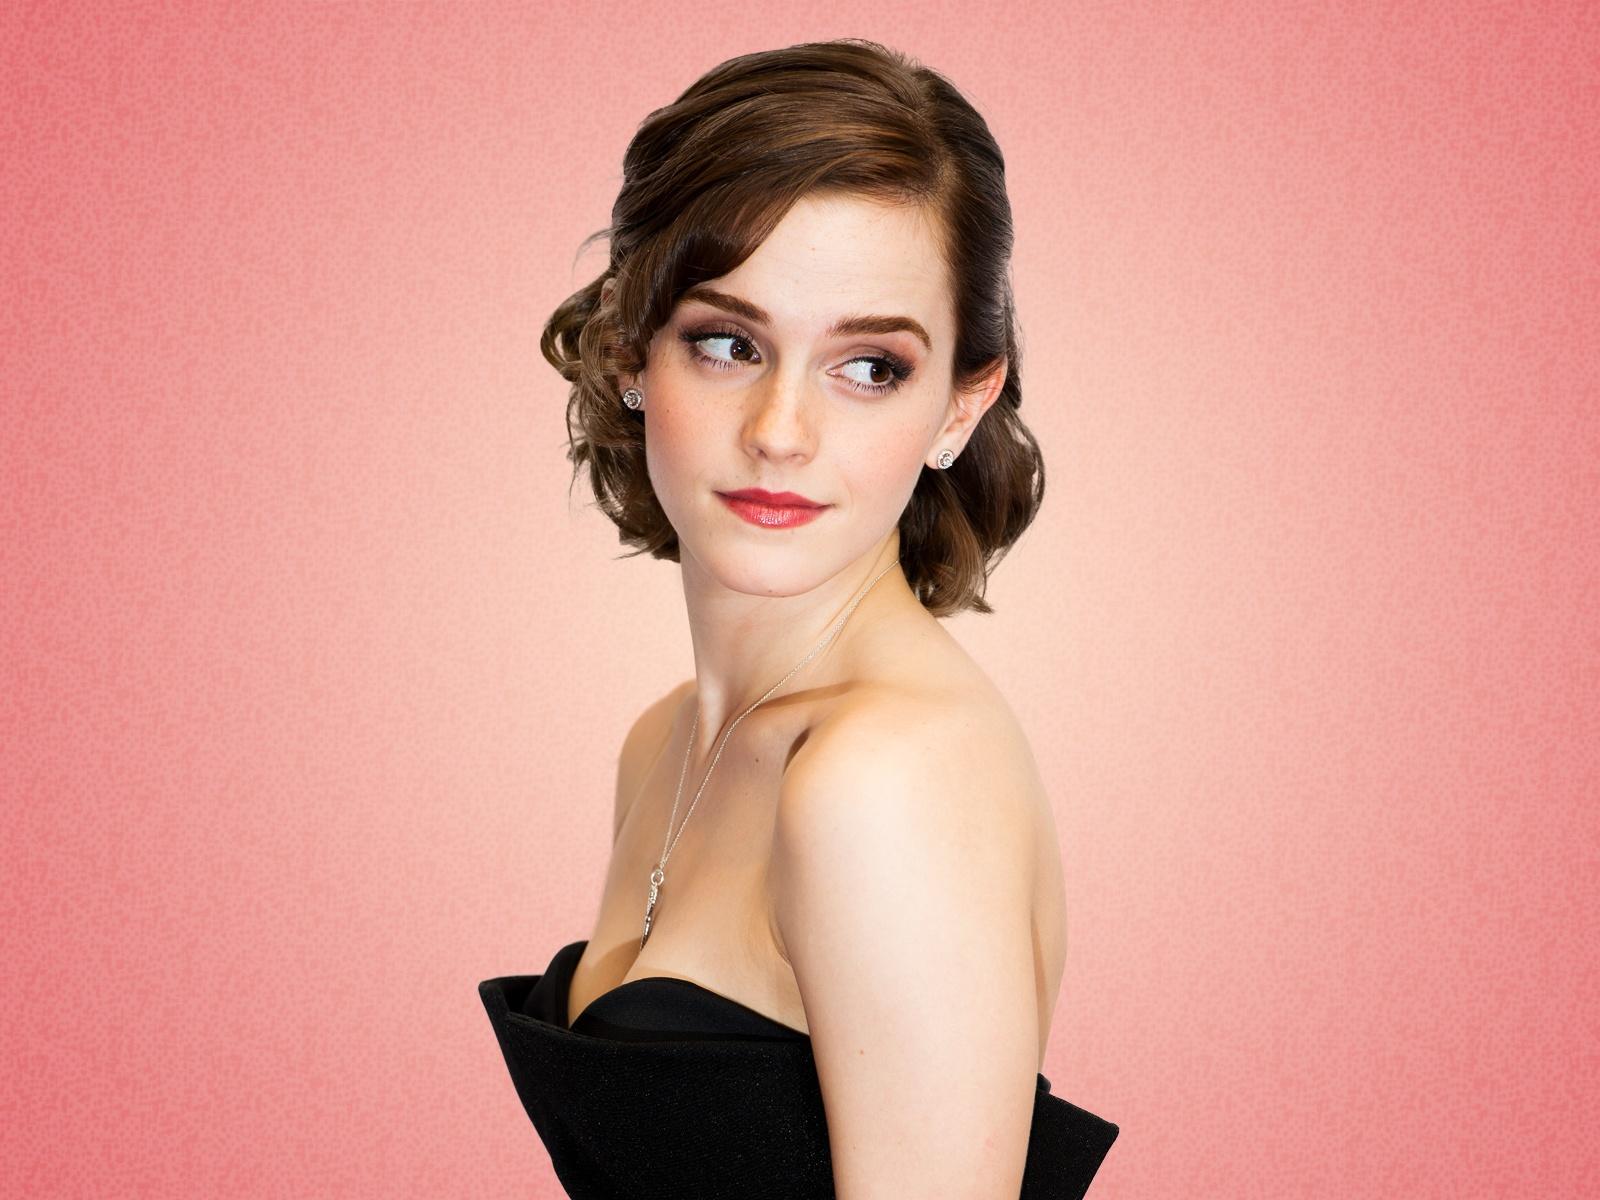 Emma Watson se convierte en princesa de Disney